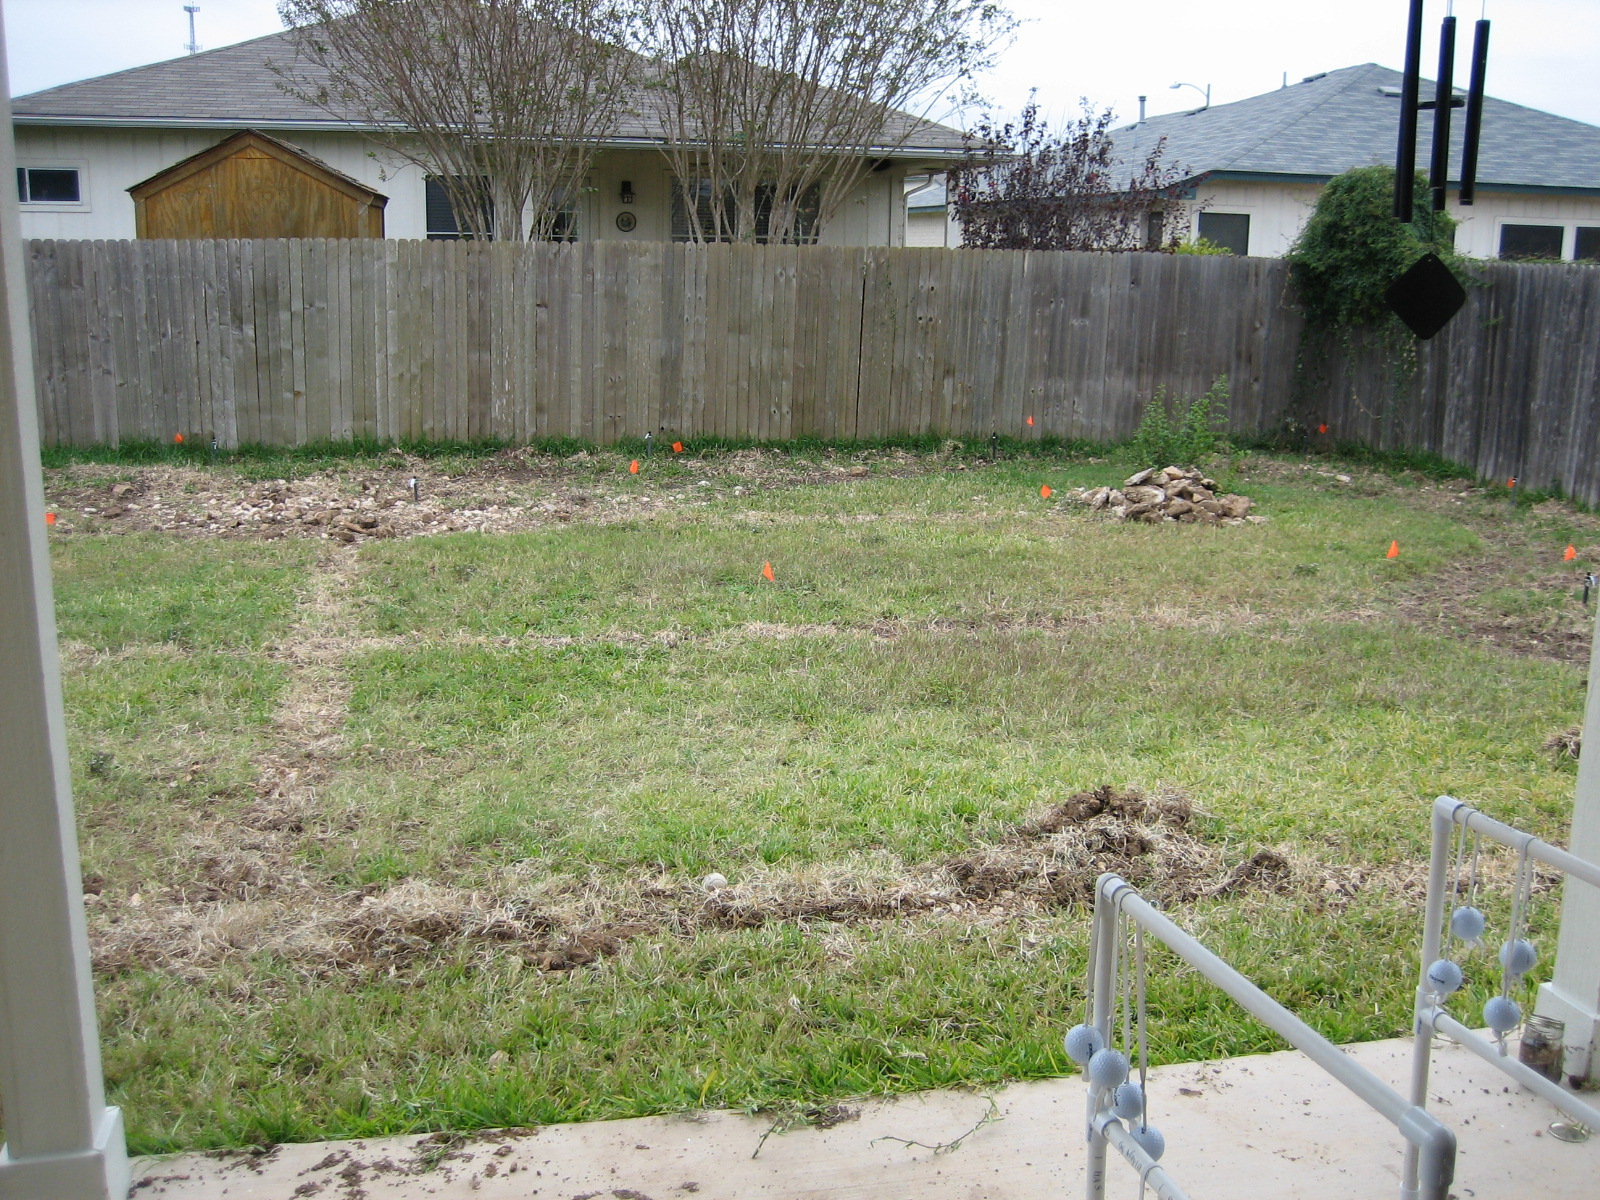 The treacherous sprinkler system project-rocks anyone?